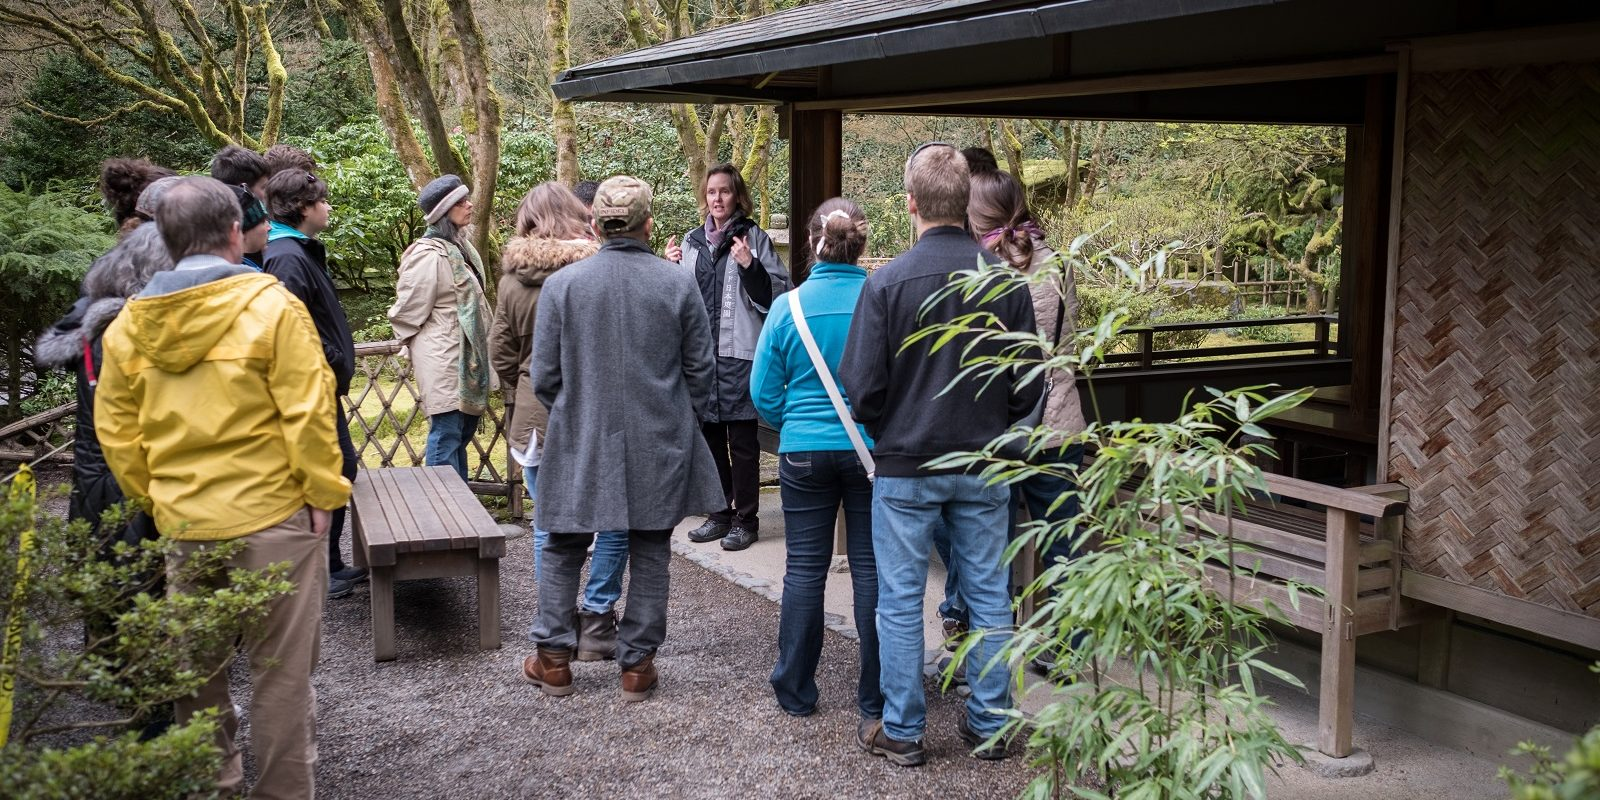 Peter Friedman_Volunteer Guides andTours-48